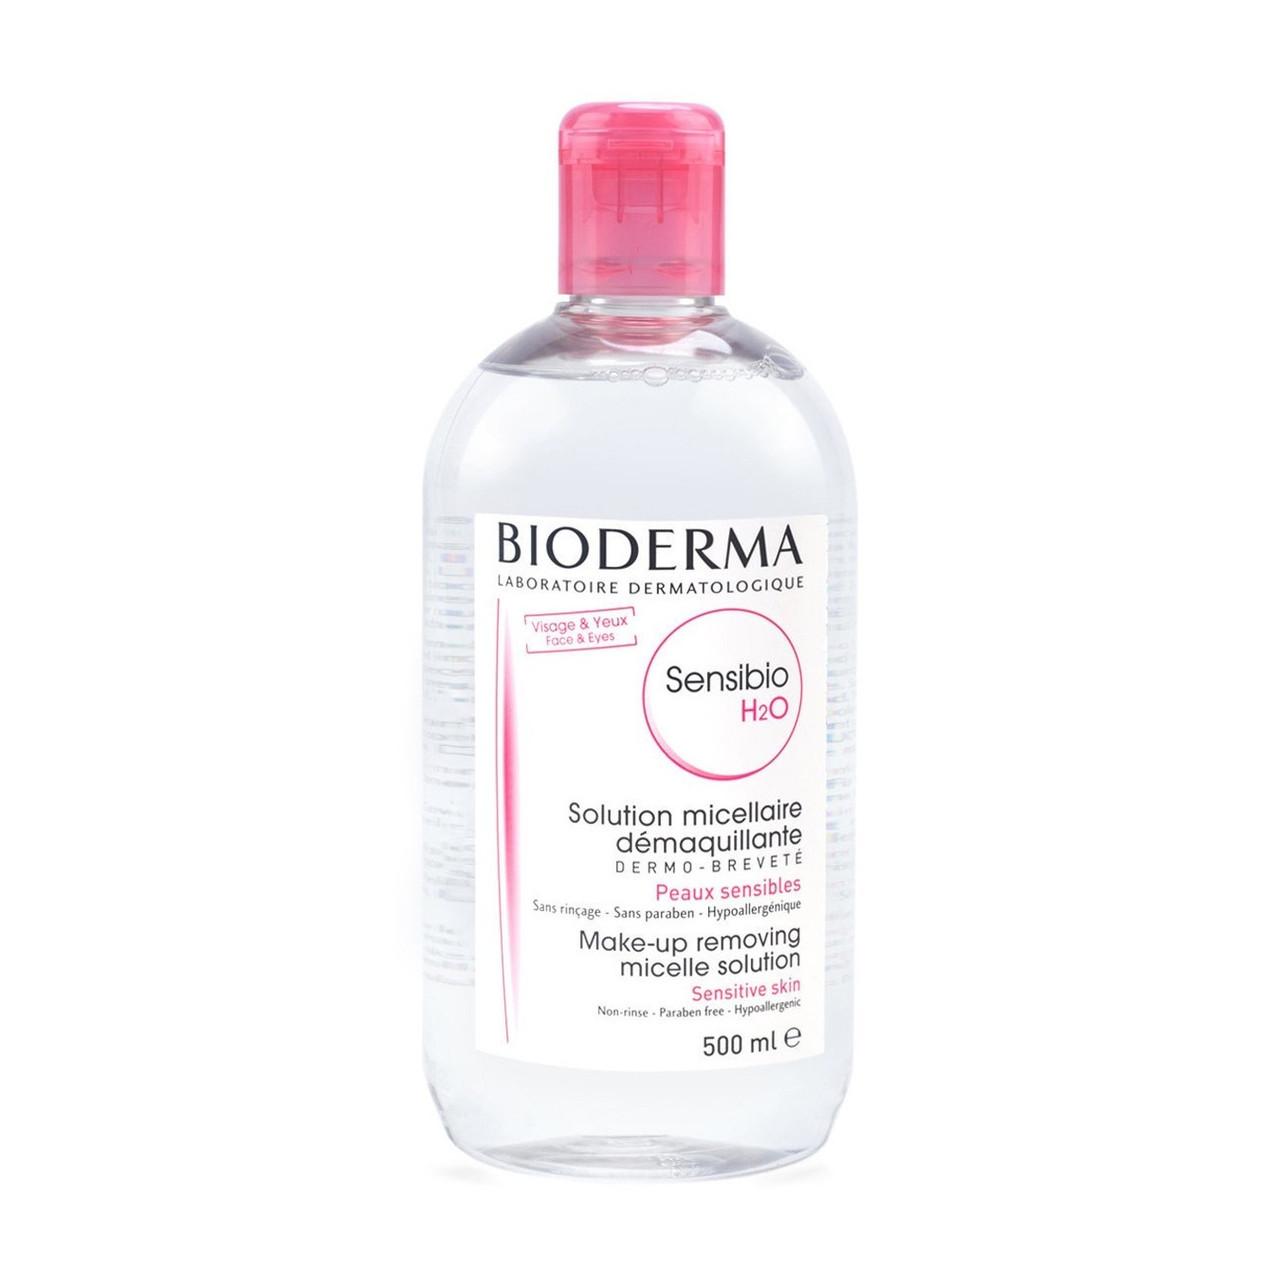 Мицеллярный лосьон Bioderma Sensibio H2O Micellaire Solution 500 мл